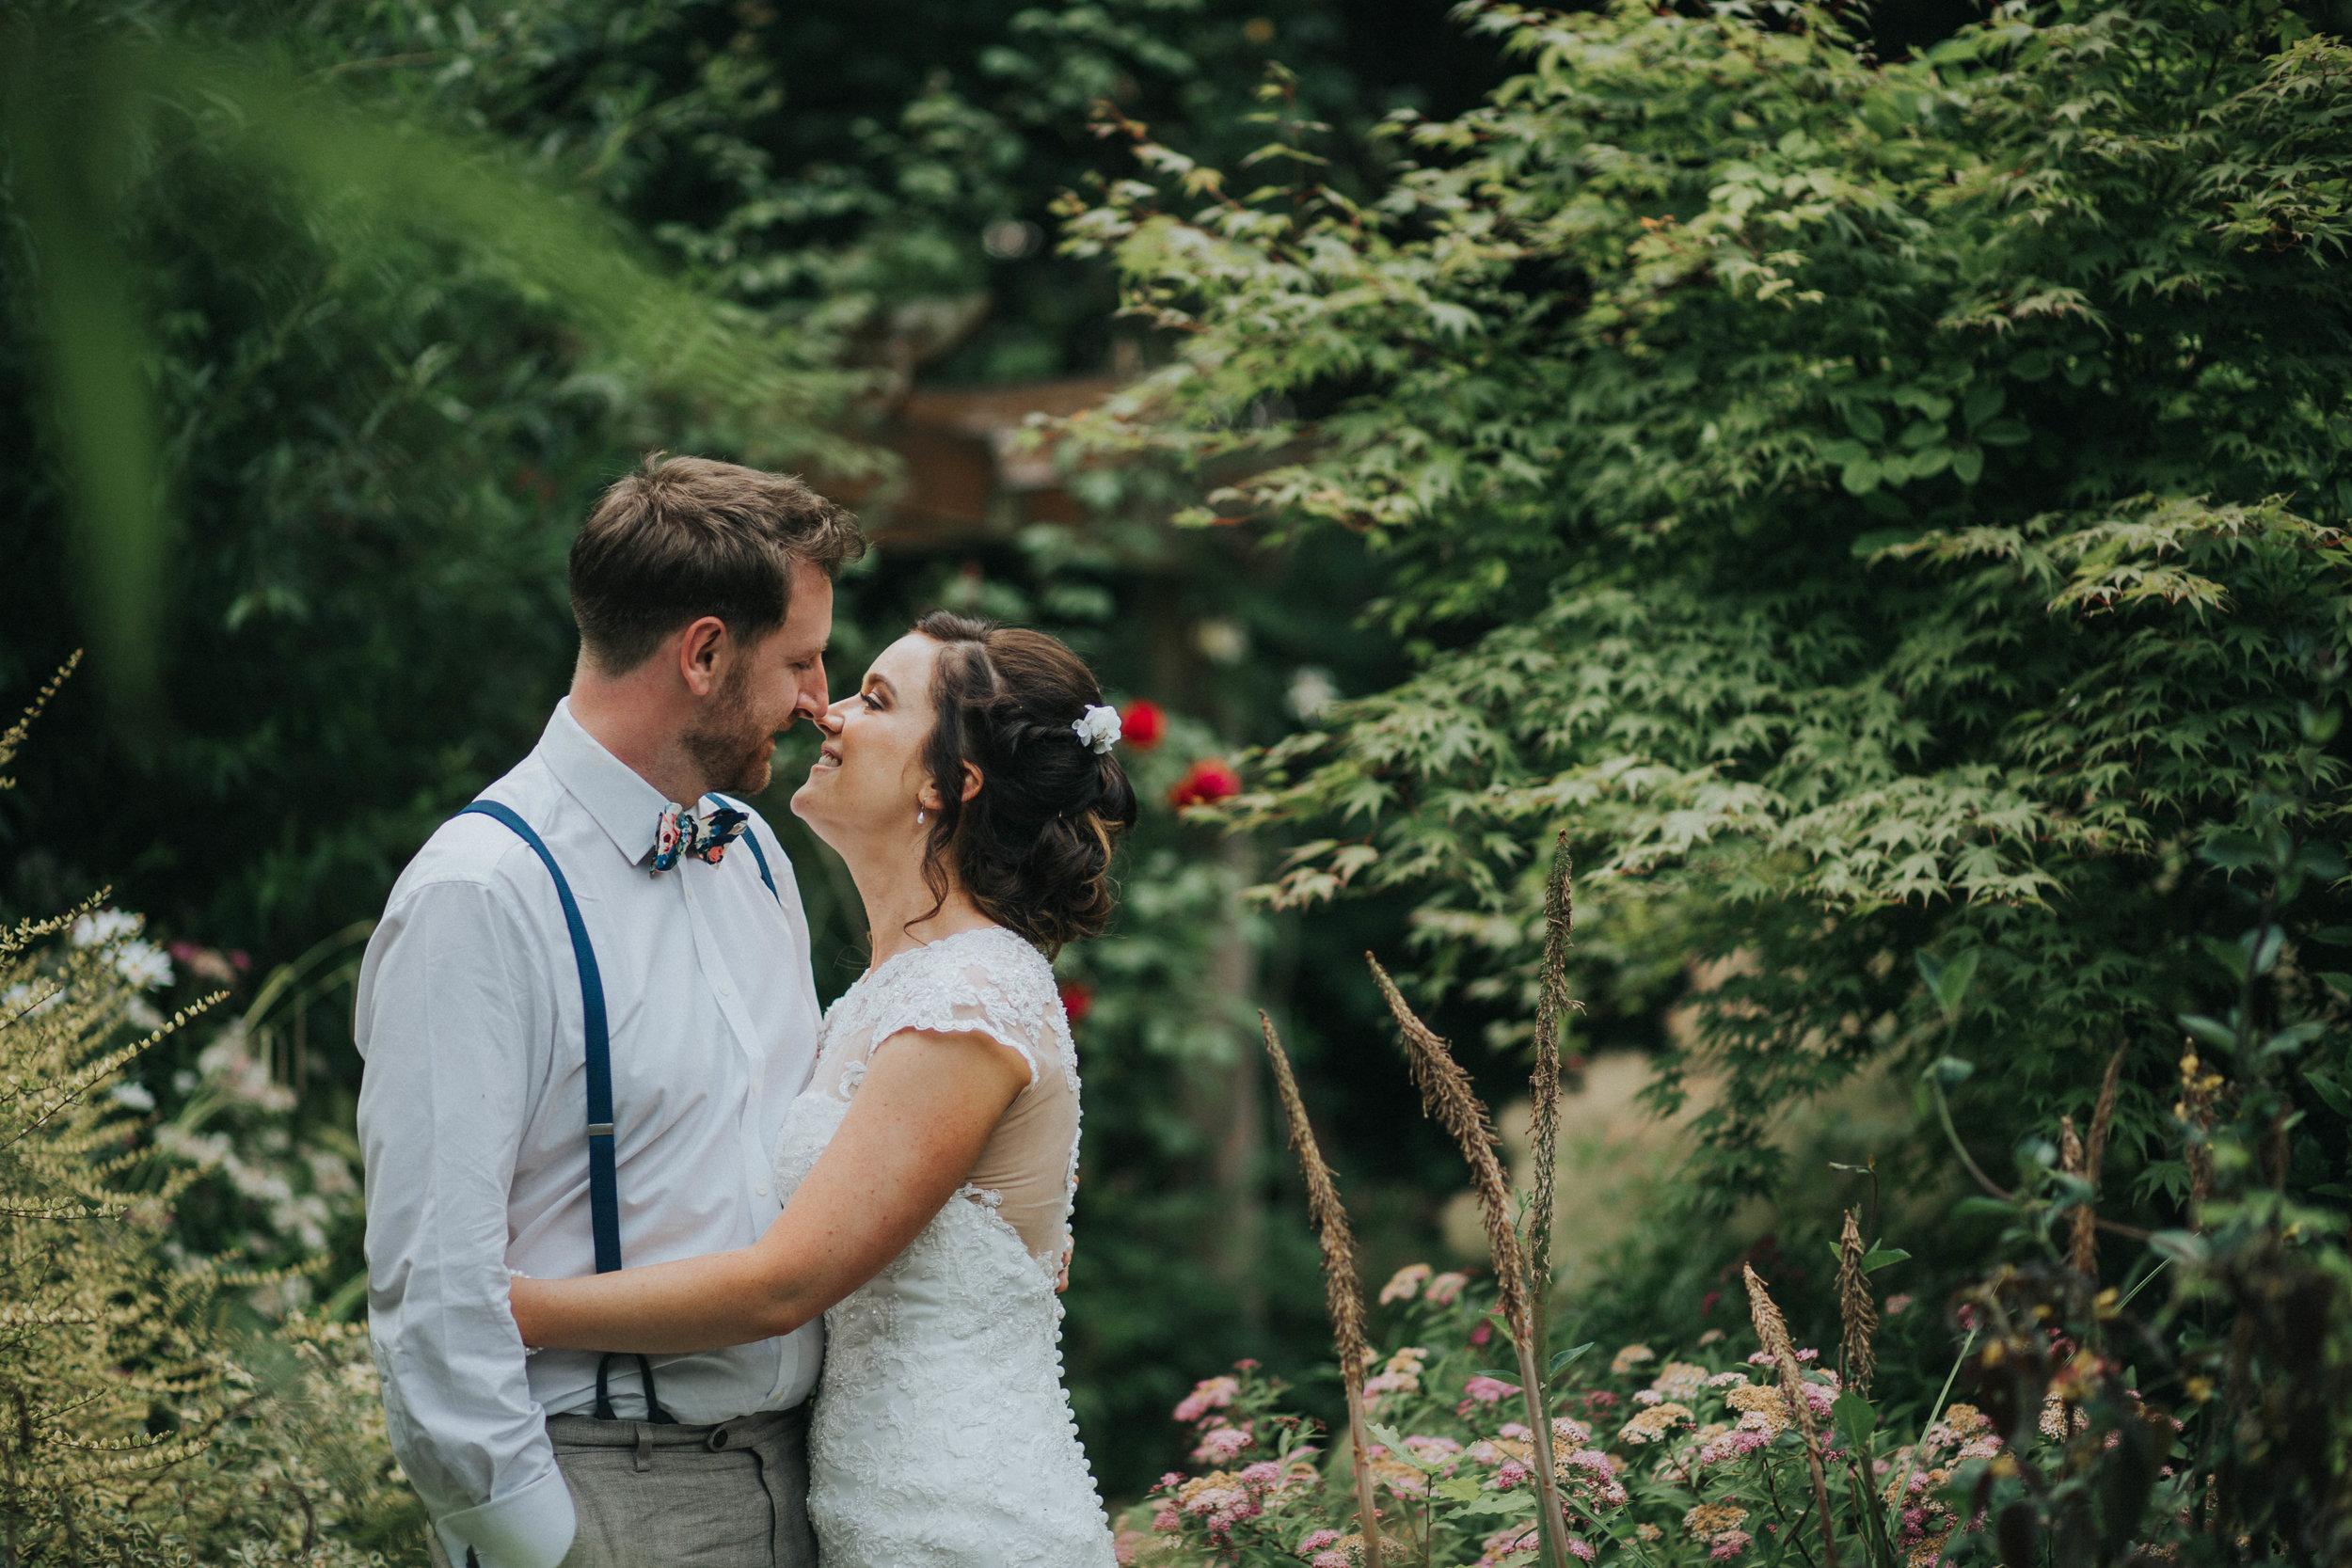 WeddingPhotographerEastSussex-106.jpg